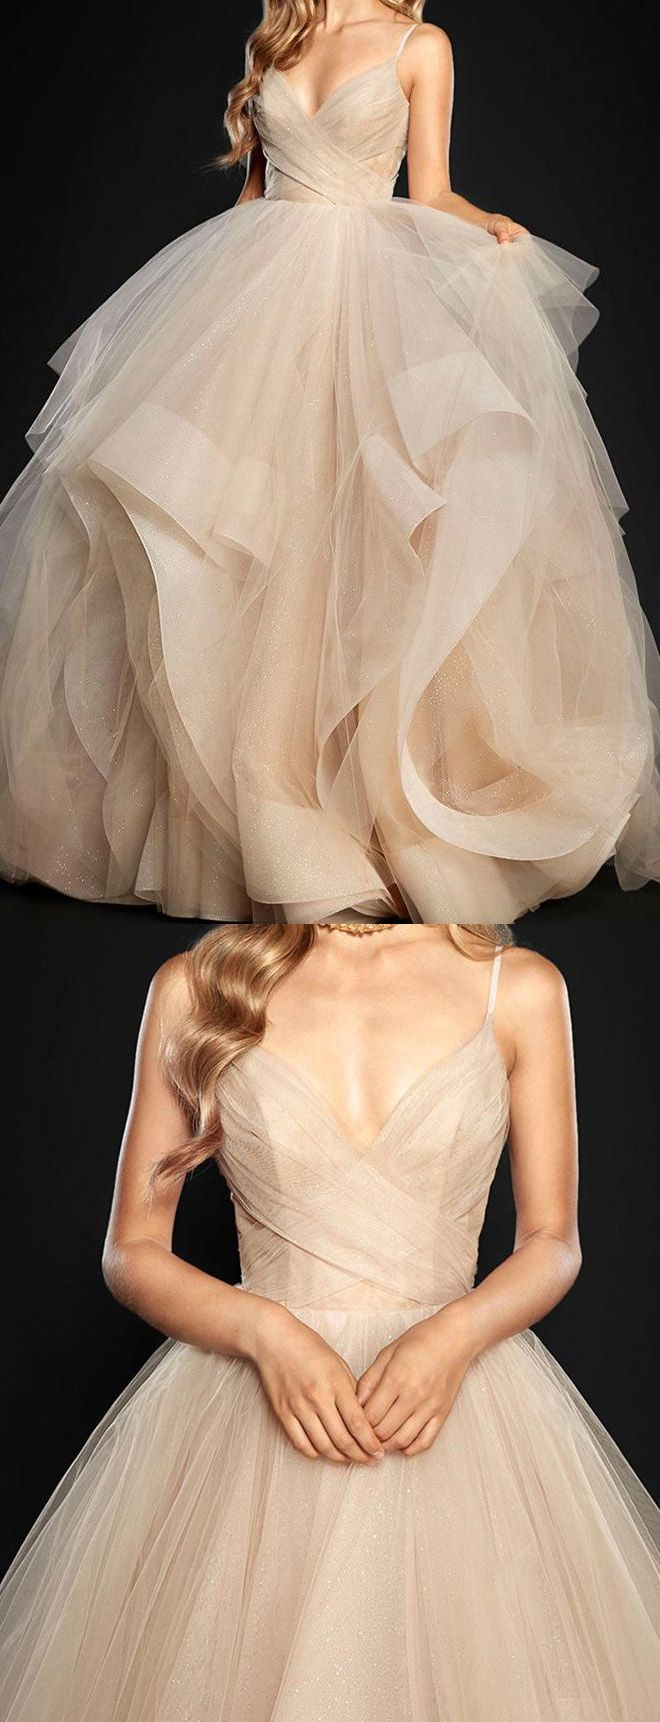 My favorite color for wedding dresses